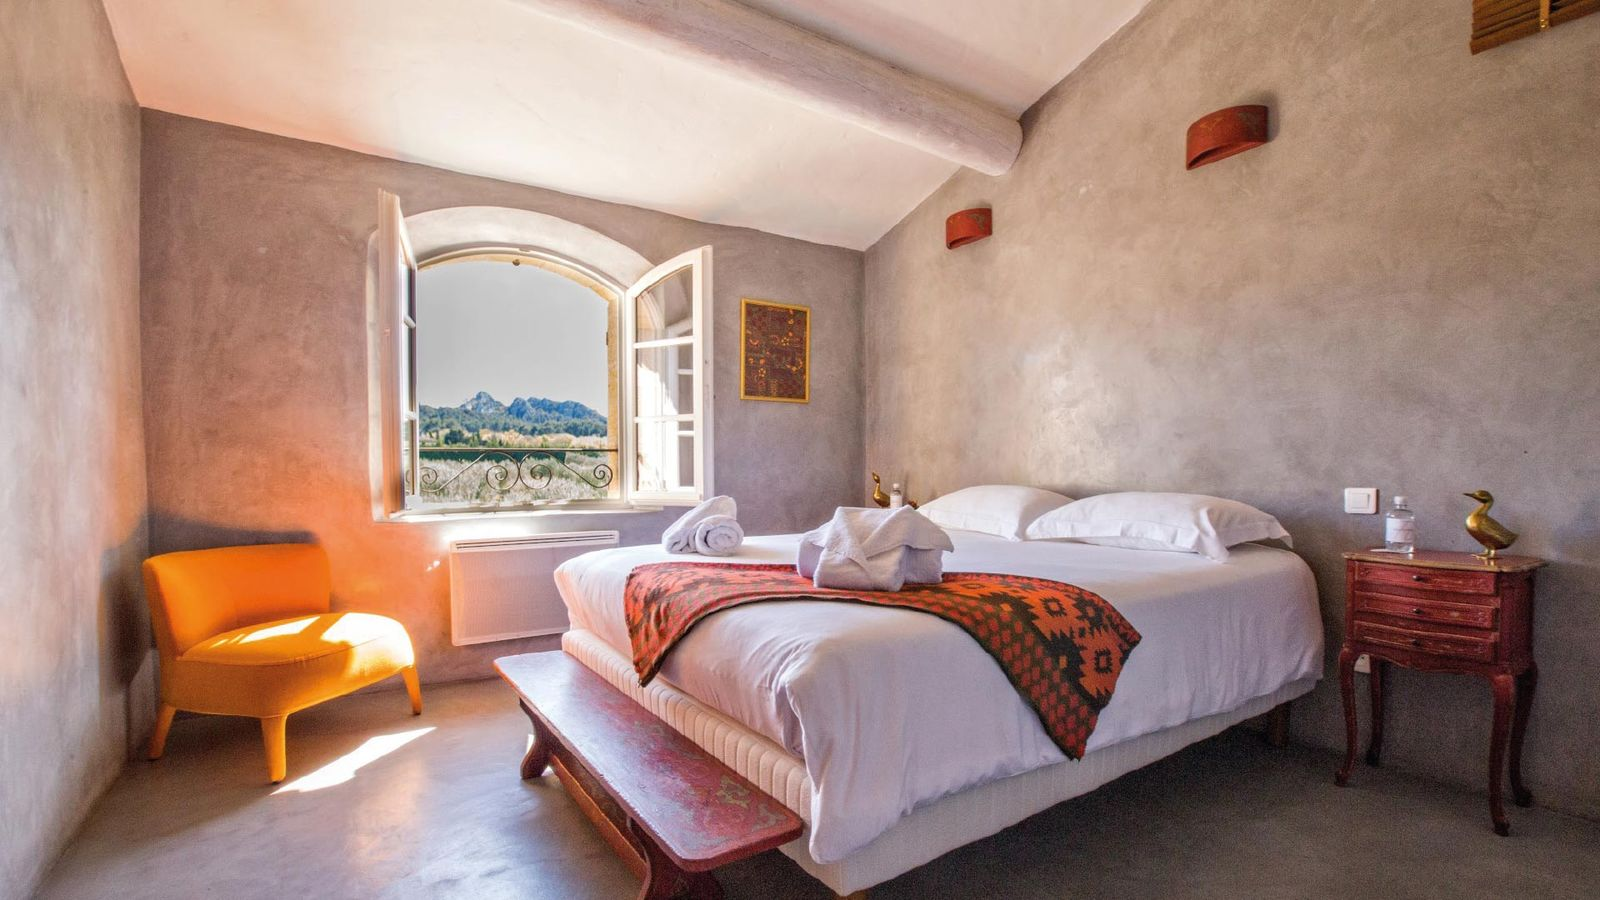 Outstanding villa Rental in Saint Remy de Provence 17